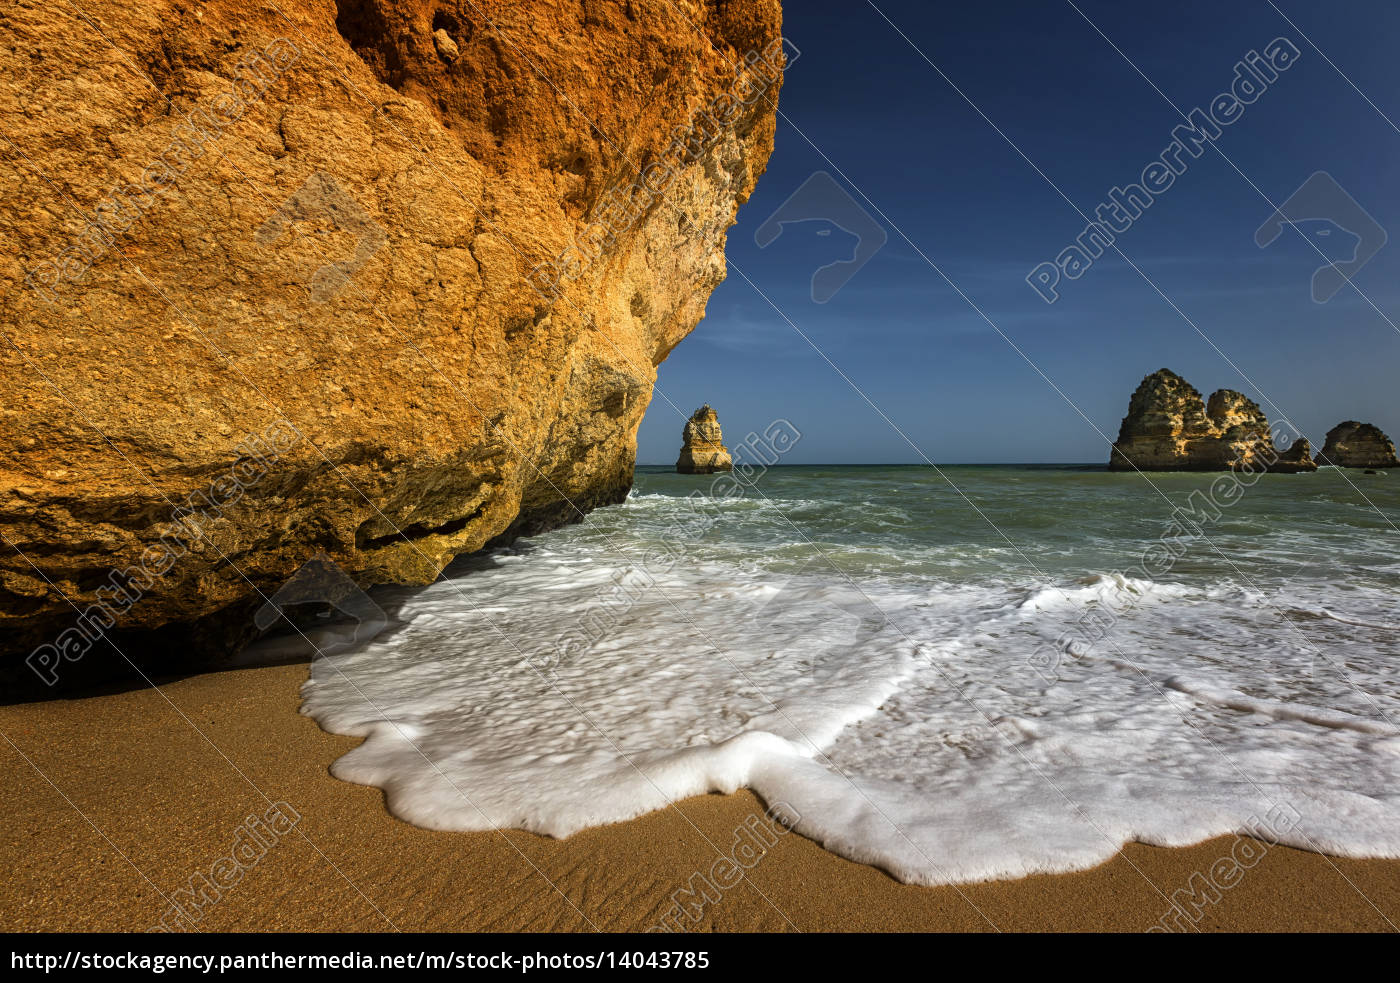 portugal, algarve, lagos, praia, do, camilo, felsalgarve - 14043785